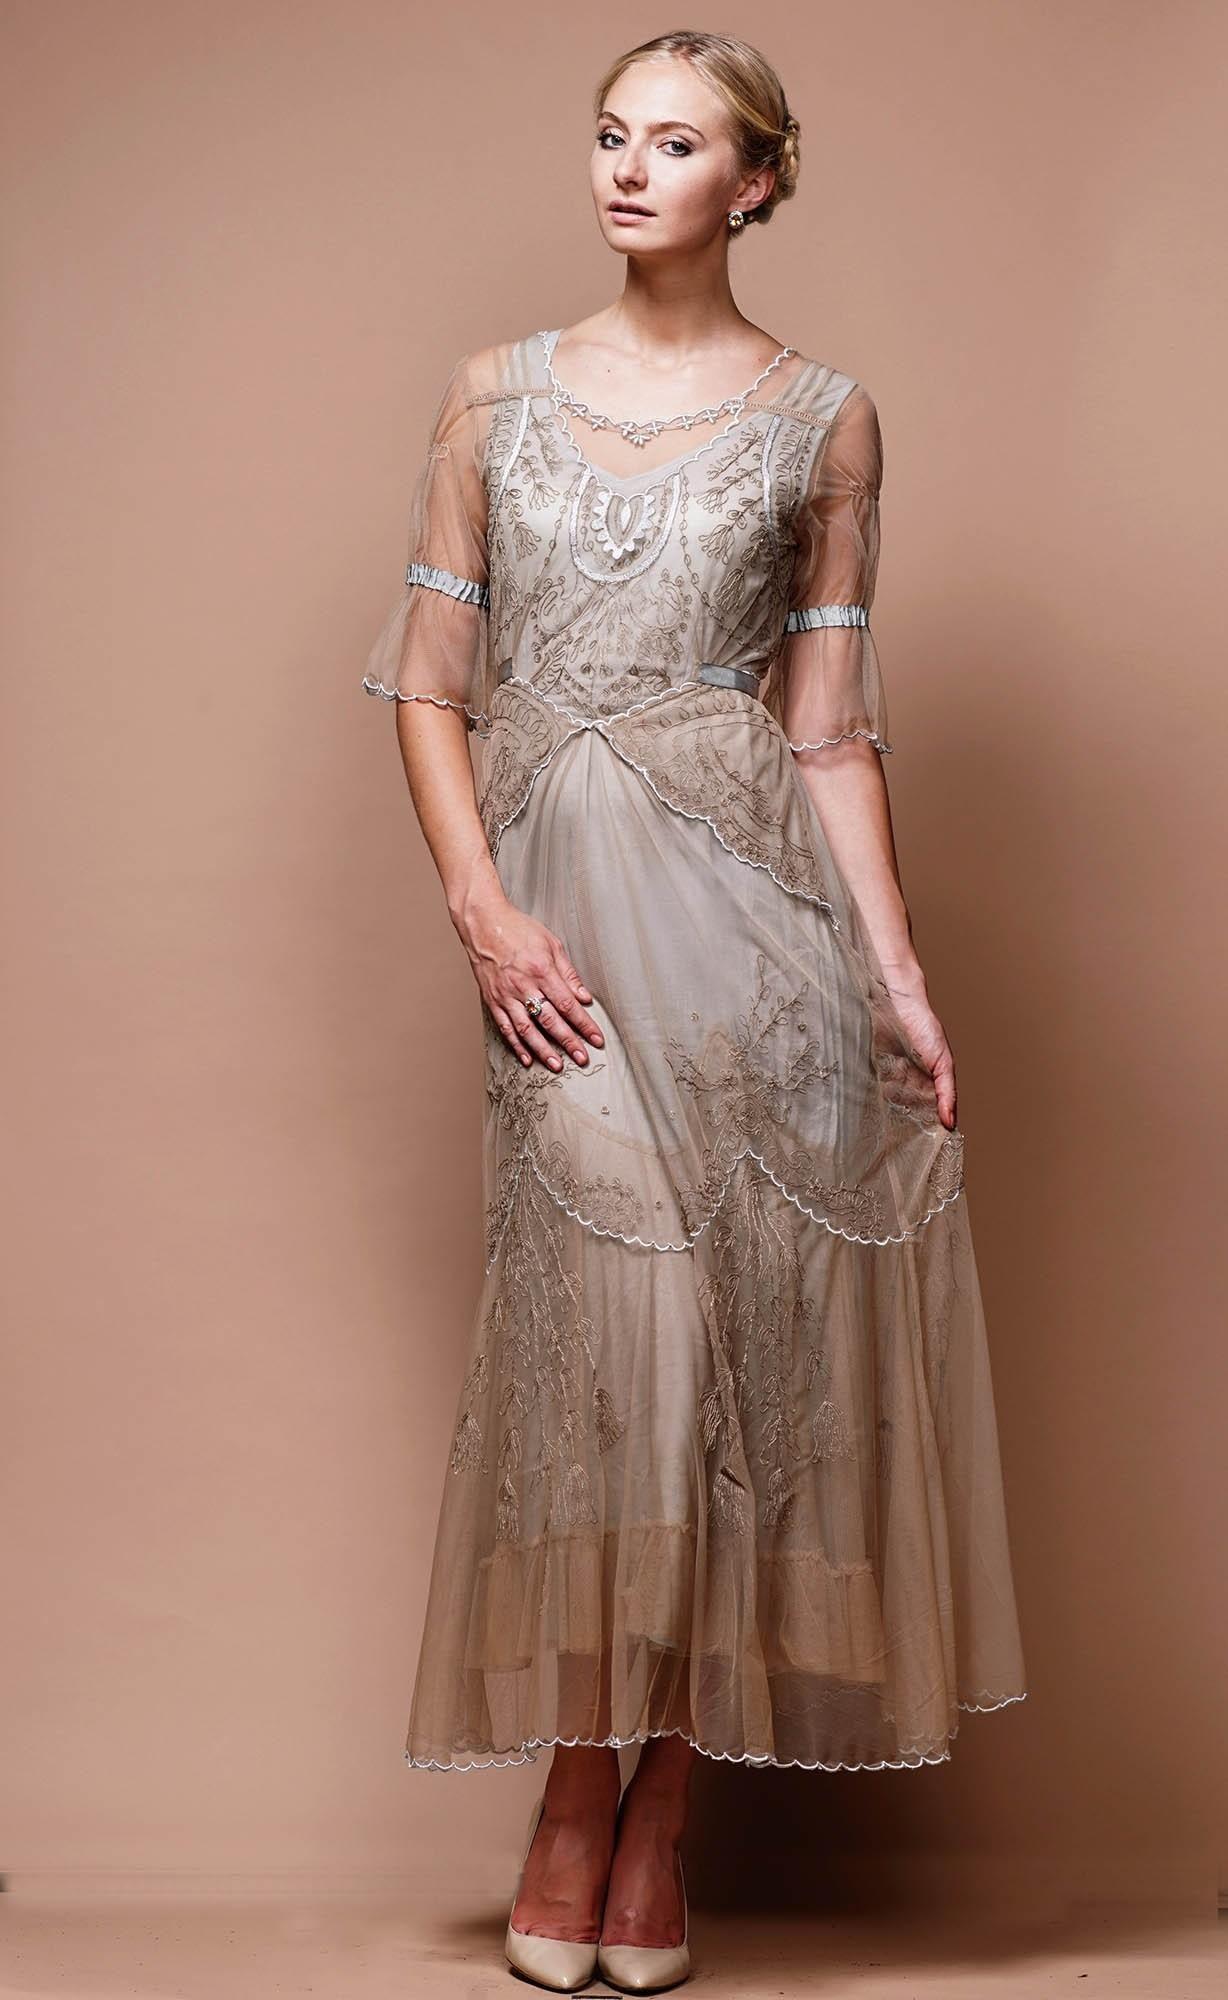 Edwardian Vintage Wedding Dress in Sand/Silver by Nataya